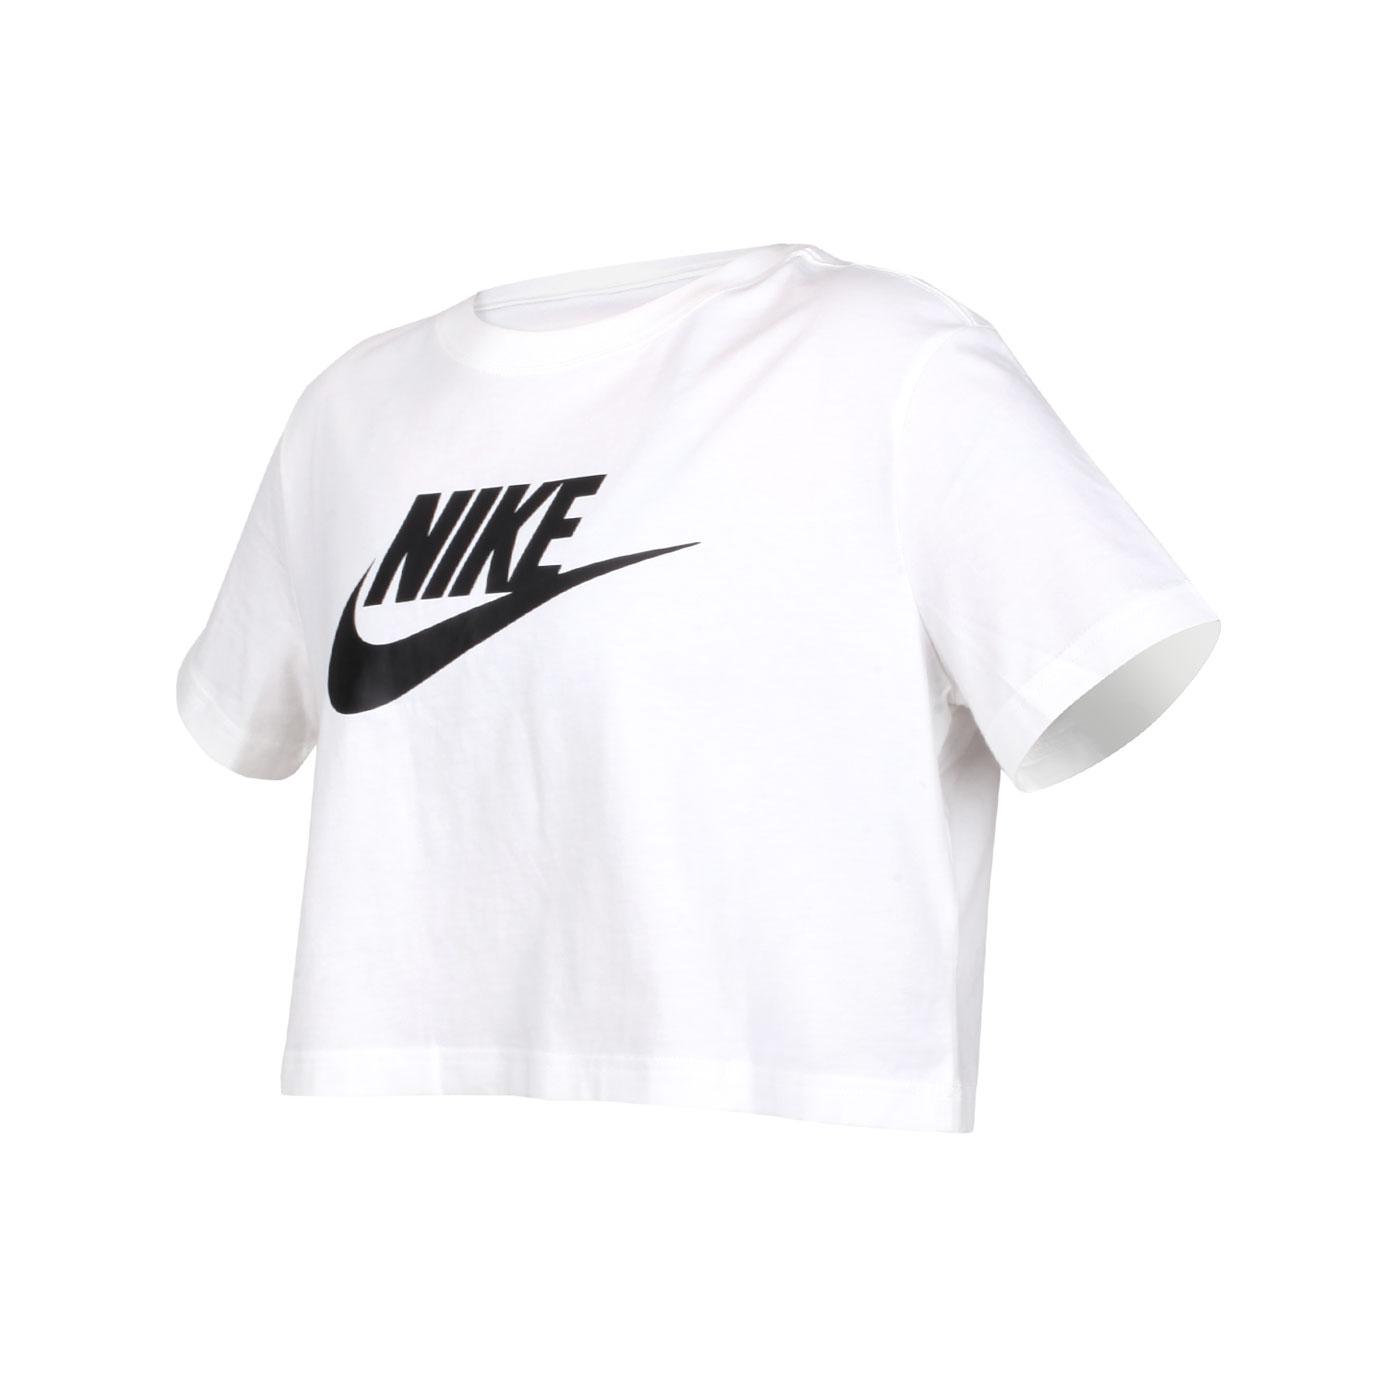 NIKE 女款短袖T恤 BV6176-100